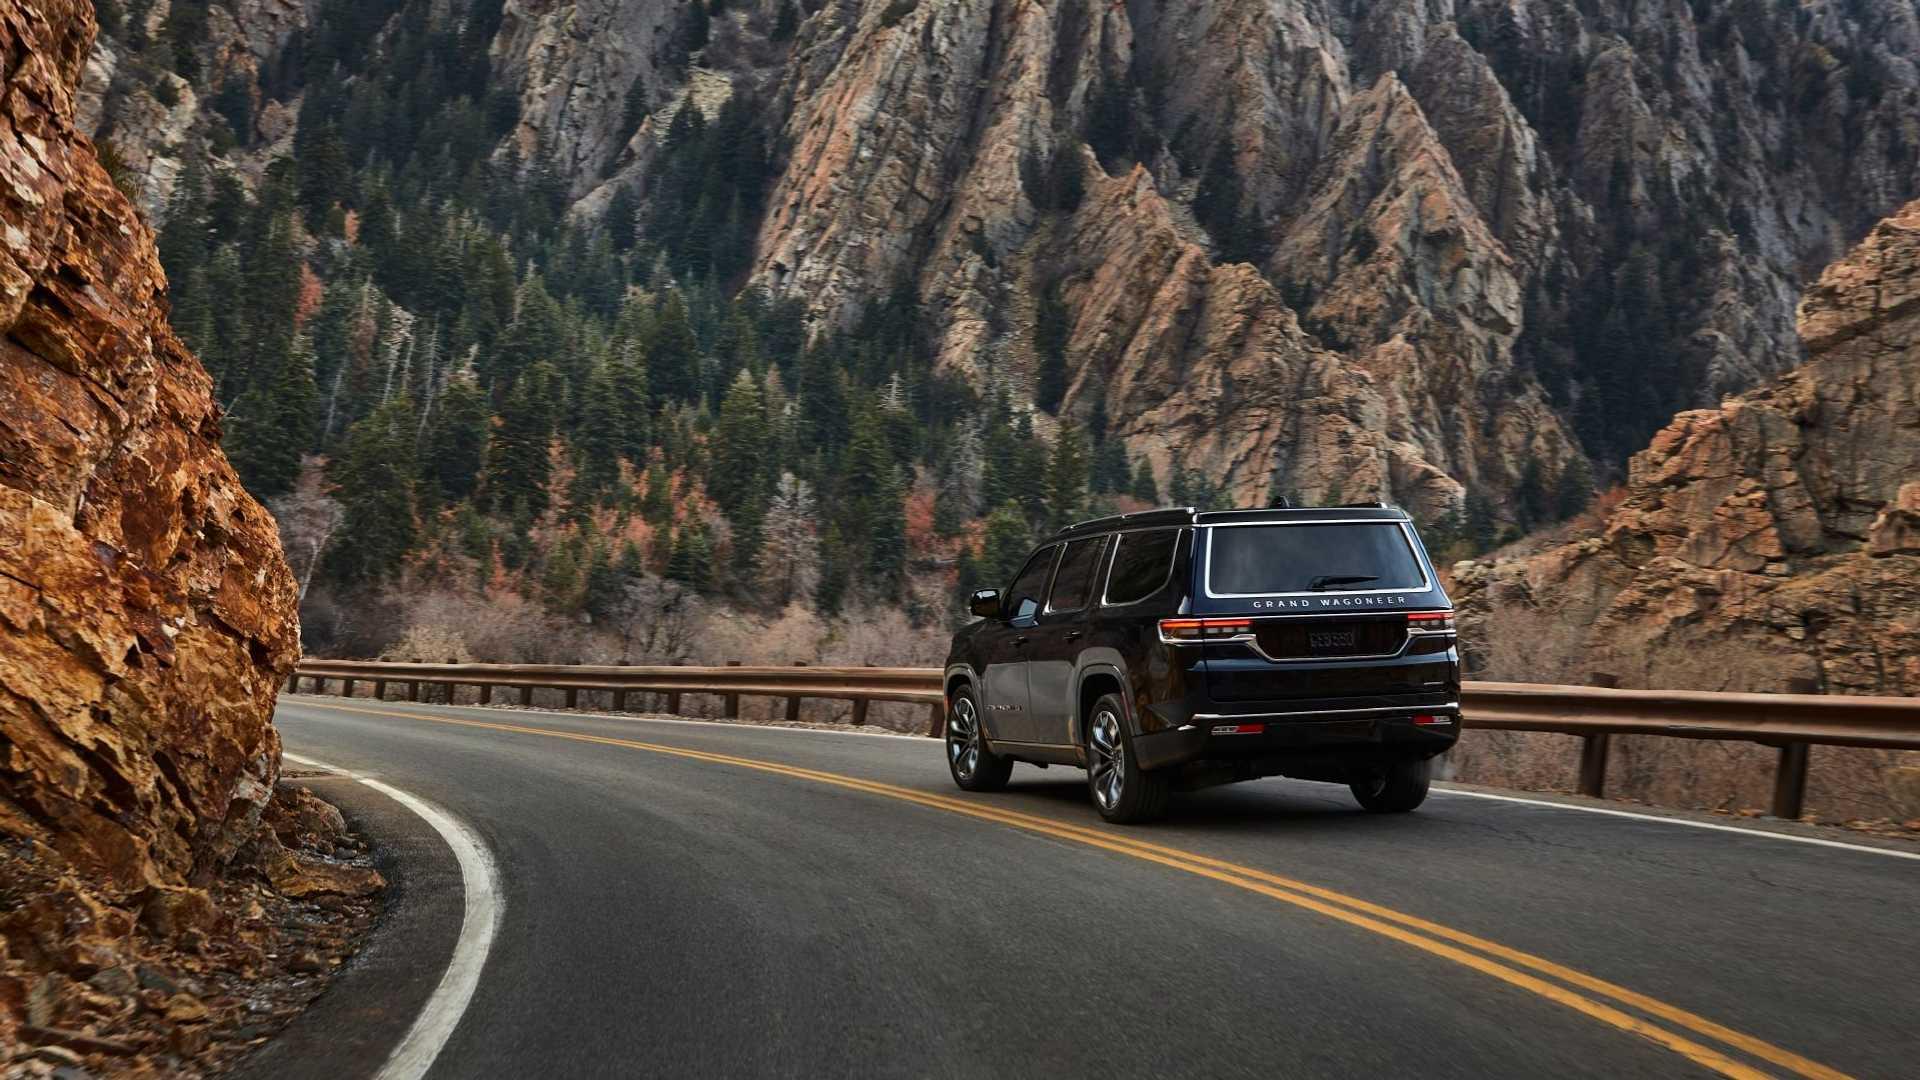 2022-jeep-grand-wagoneer-exterior-rear-quarter-1